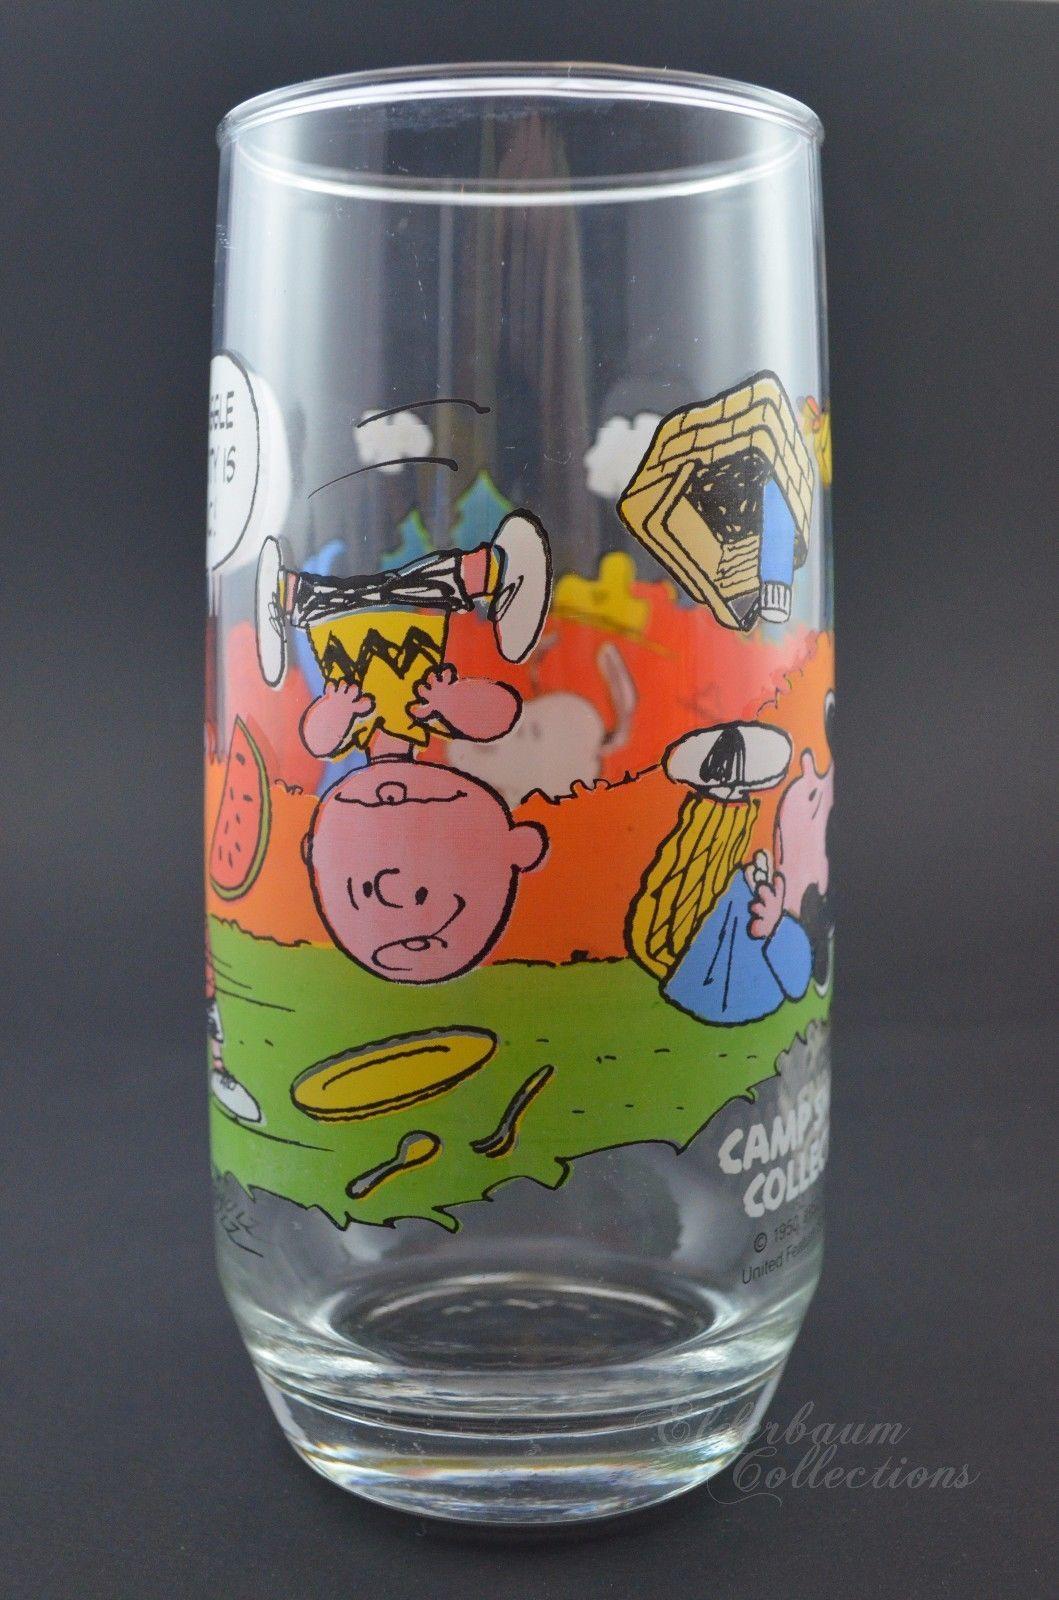 de23ade12b S l1600. S l1600. Previous. Peanuts Charlie Brown Glass 1965 McDonalds  Schulz Camp Snoopy Cup Vintage